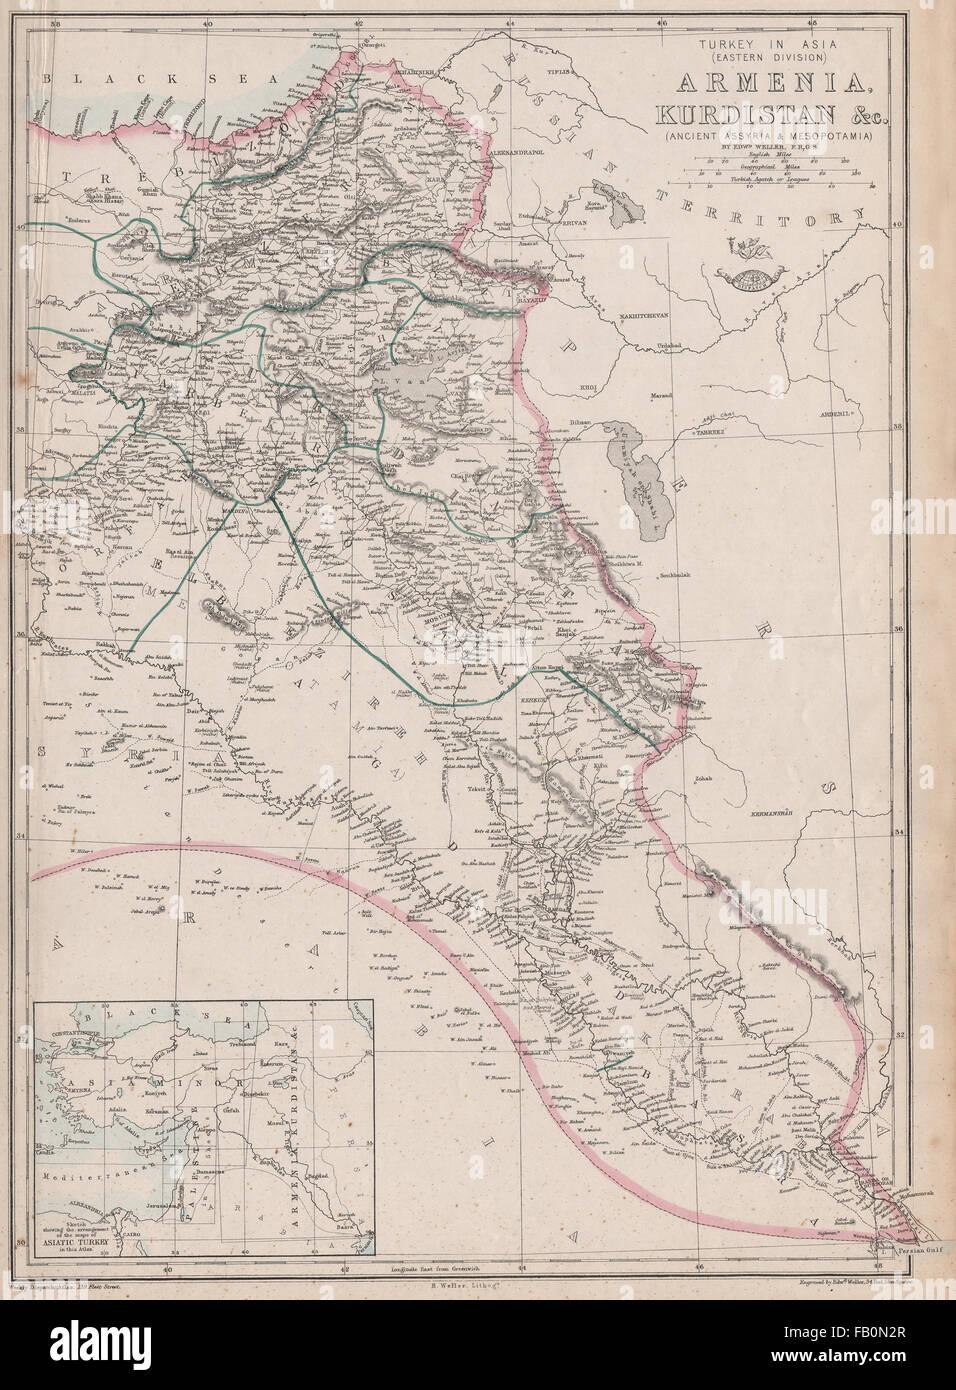 Antiques Art Prints Turkey In Asia East Armenia Kurdistan Assyria Mesopotamia Iraq Weller 1862 Map Various Styles